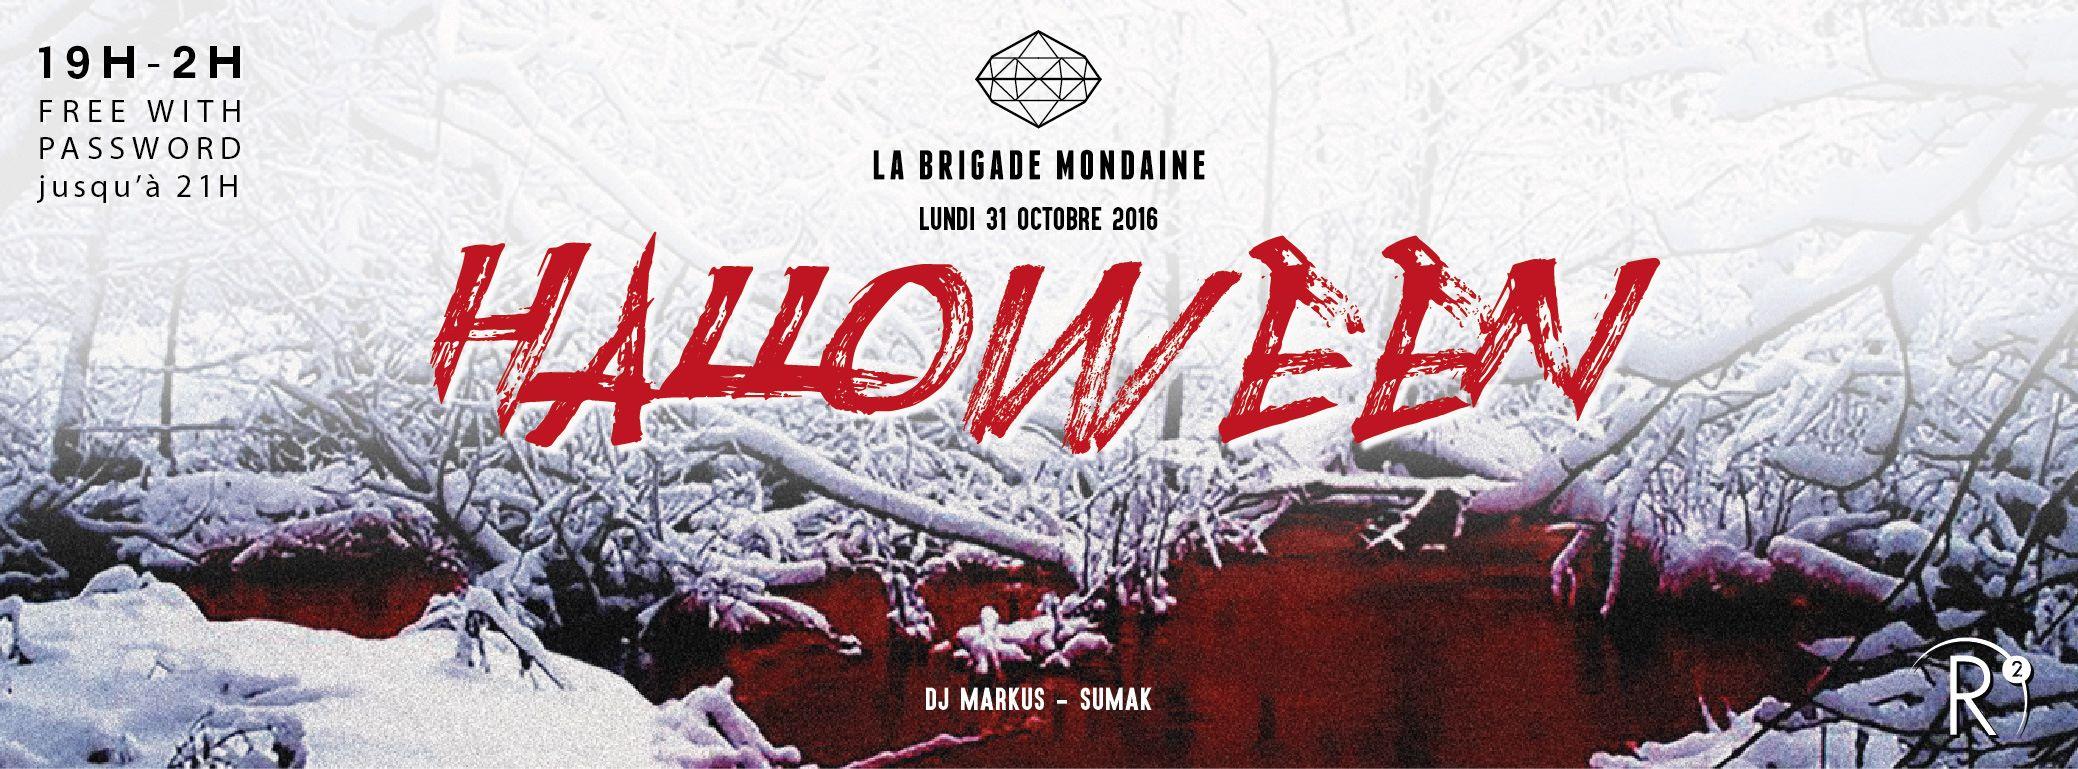 soiree-halloween-brigade-mondaine